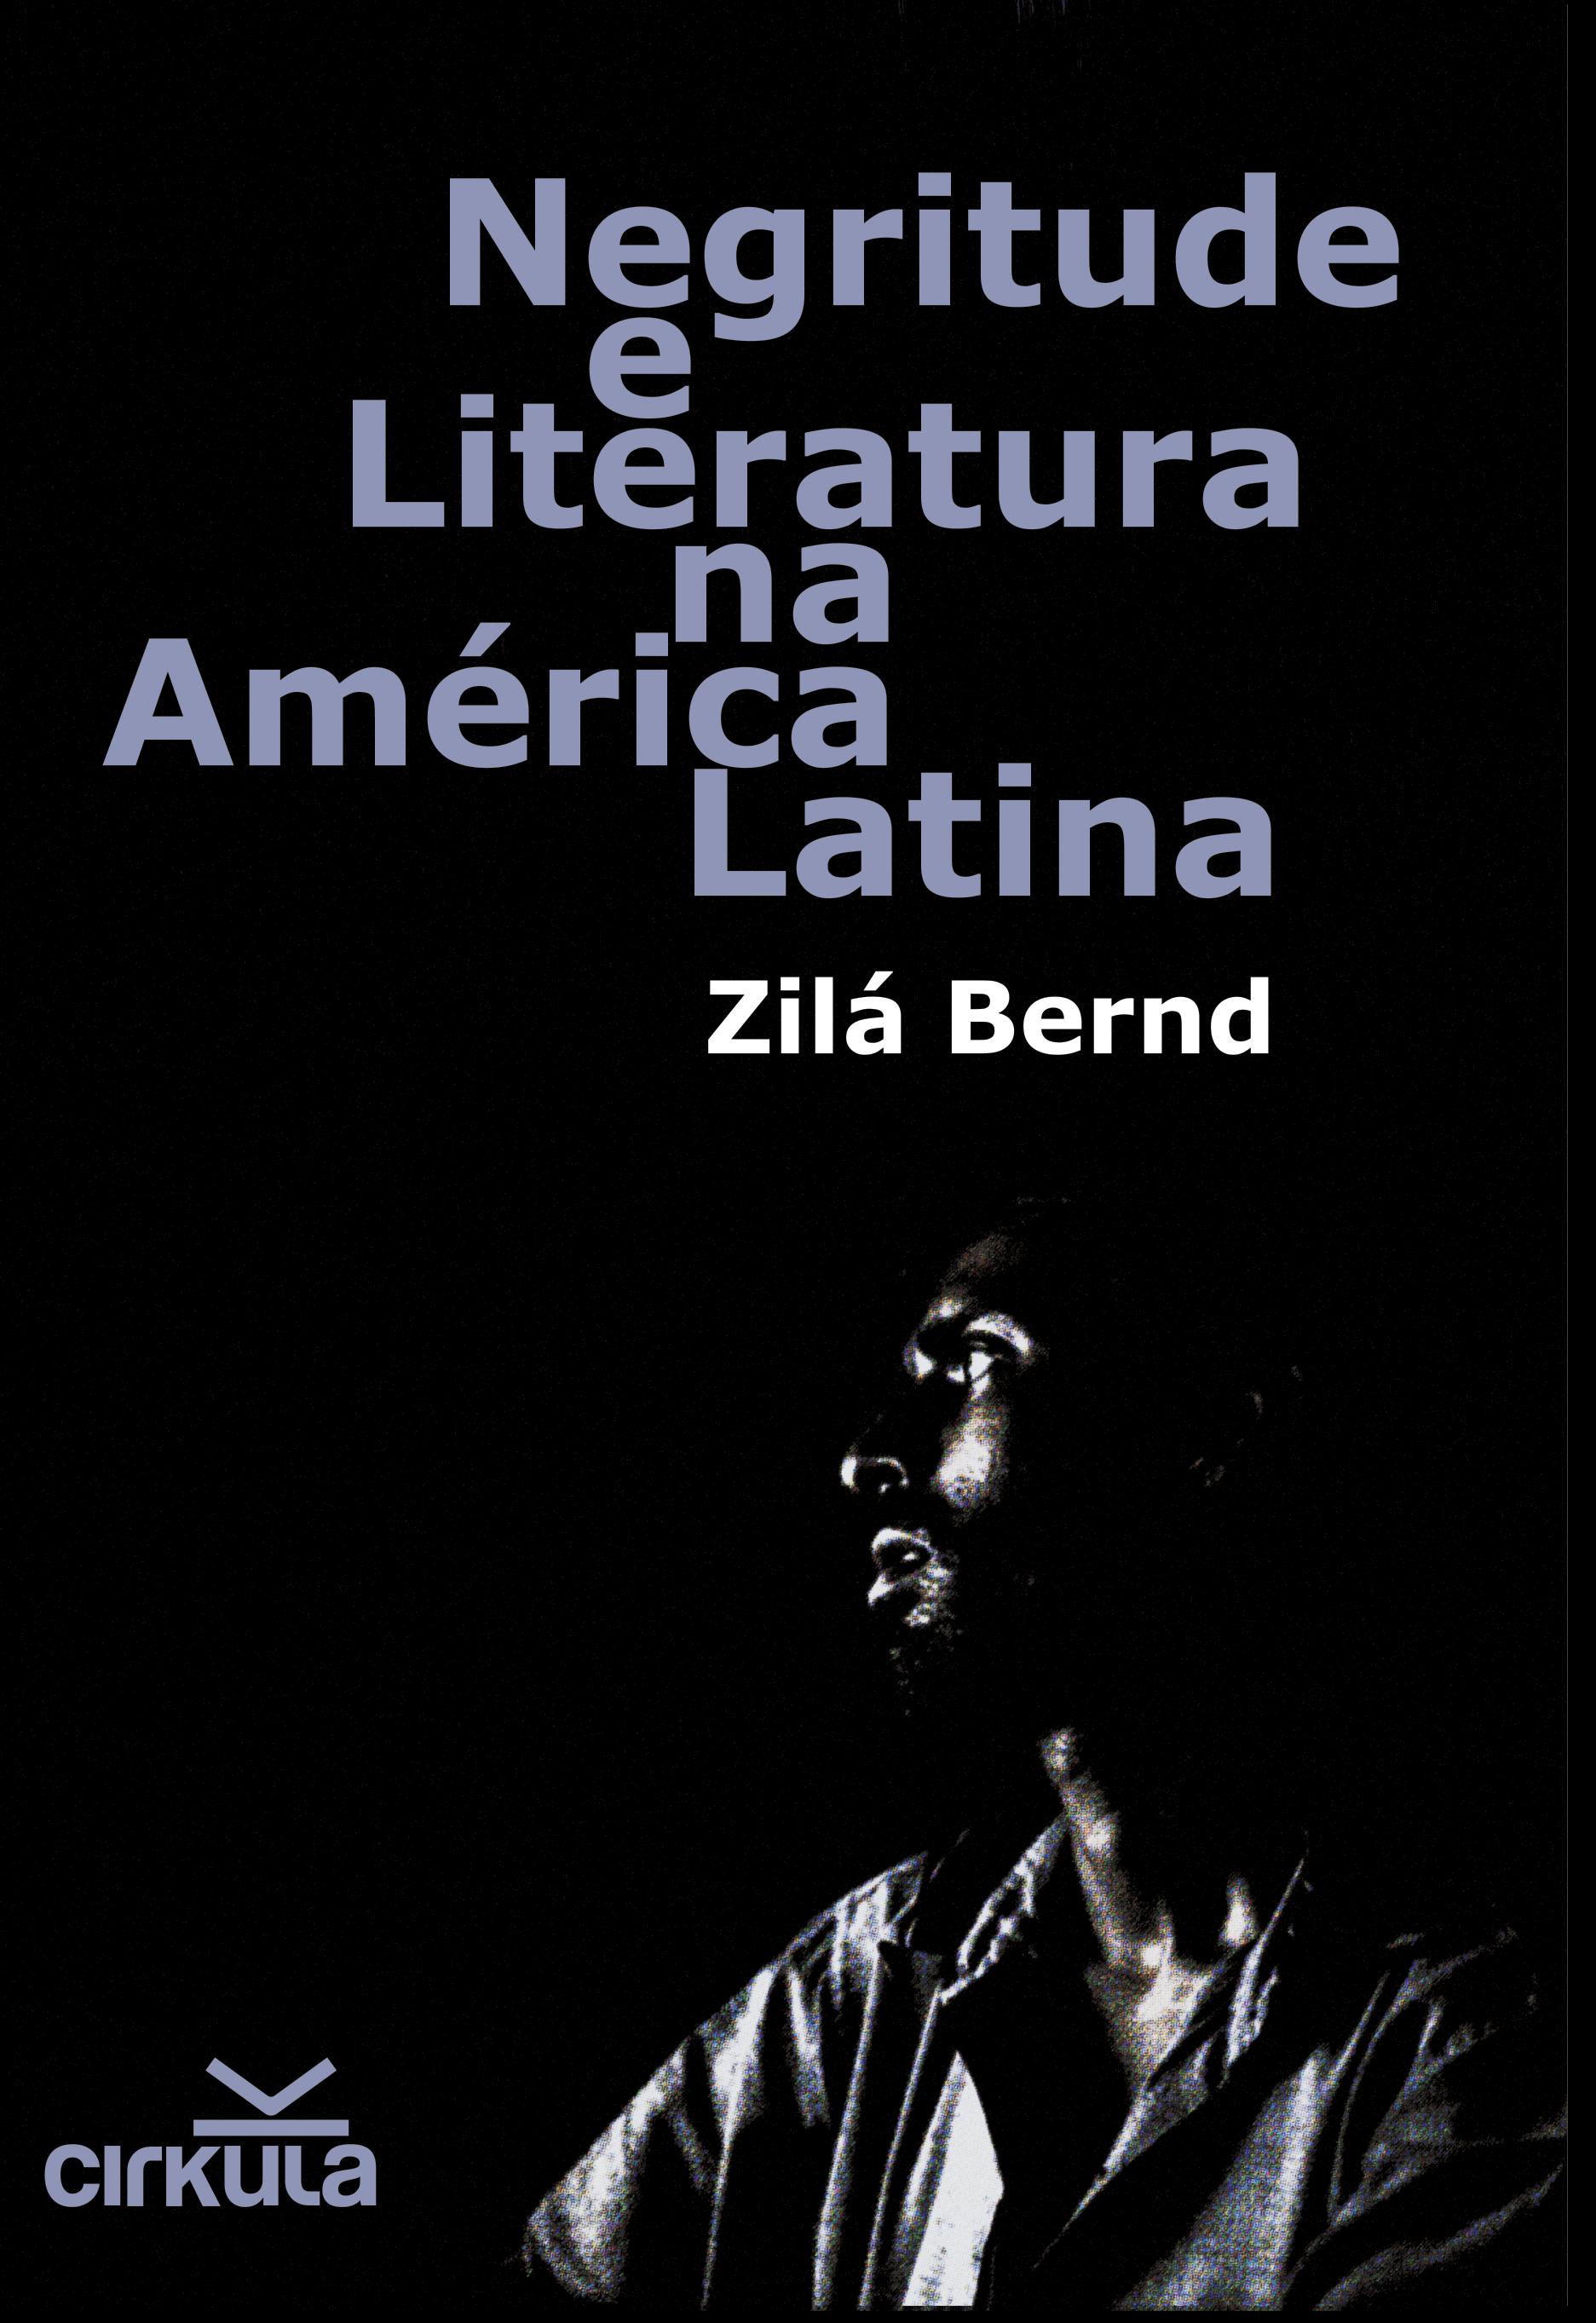 Negritude e Literatura na América Latina